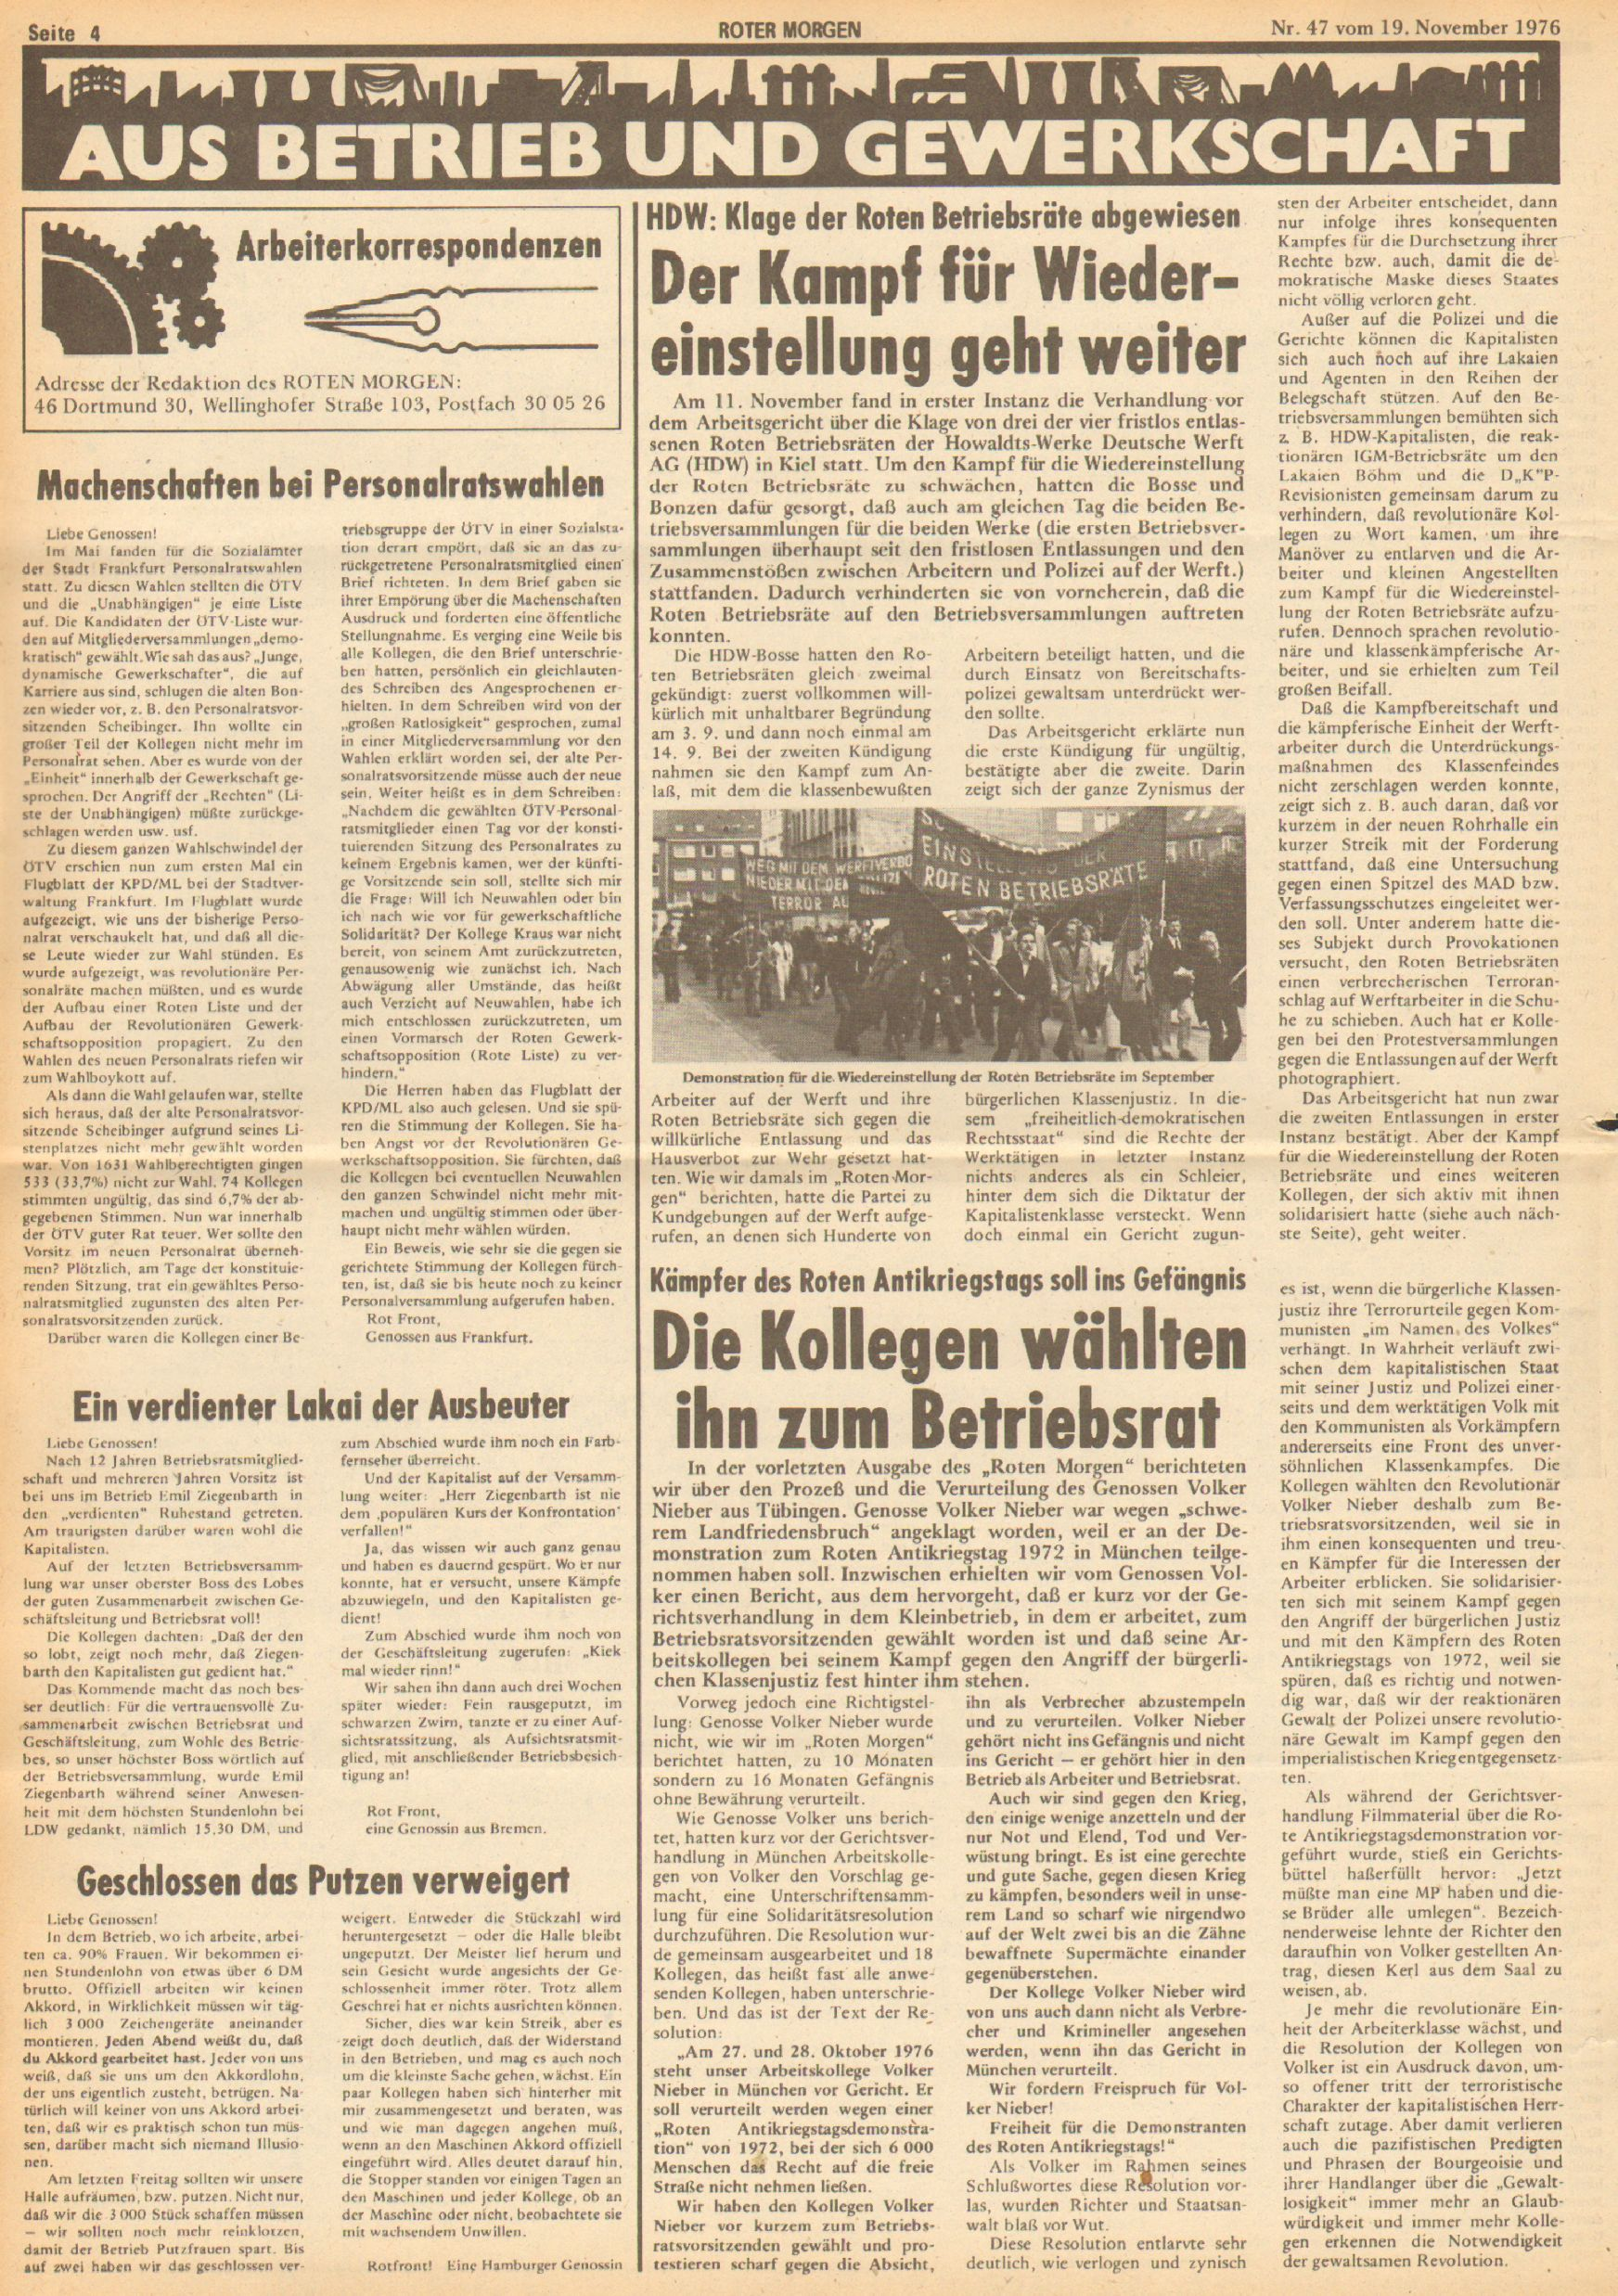 Roter Morgen, 10. Jg., 19. November 1976, Nr. 47, Seite 4